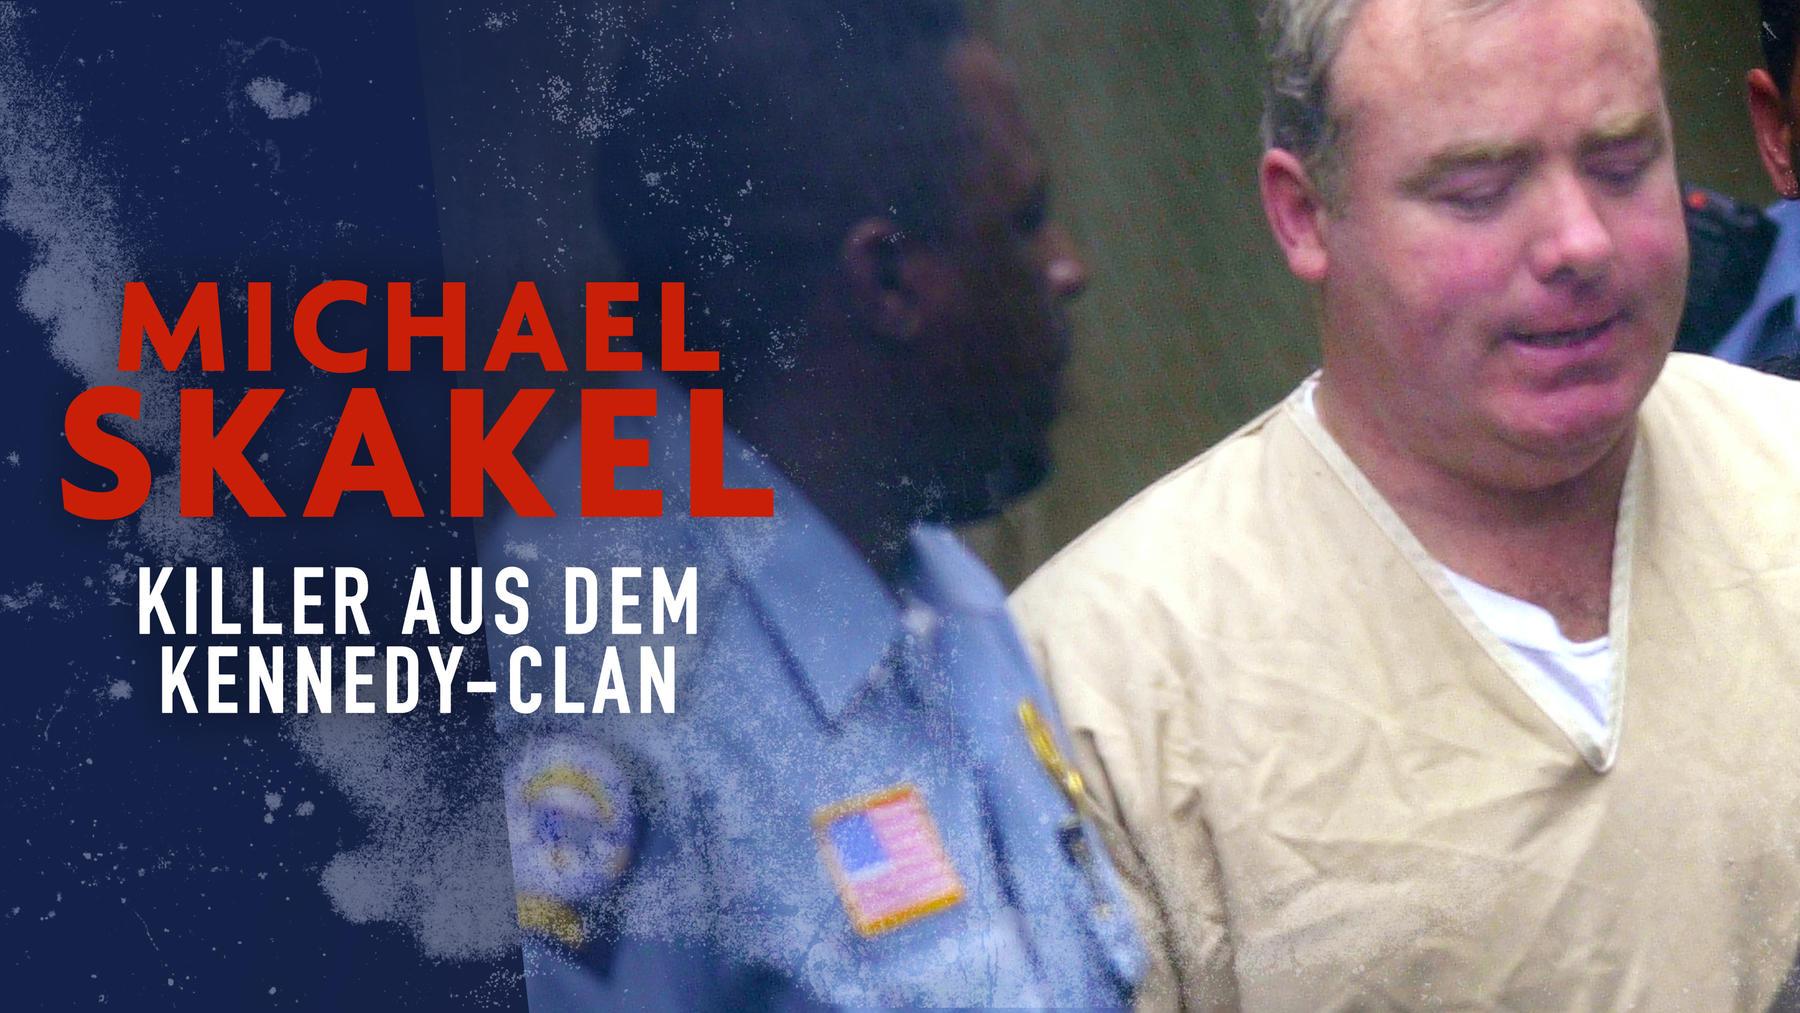 Michael Skakel: Killer aus dem Kennedy-Clan